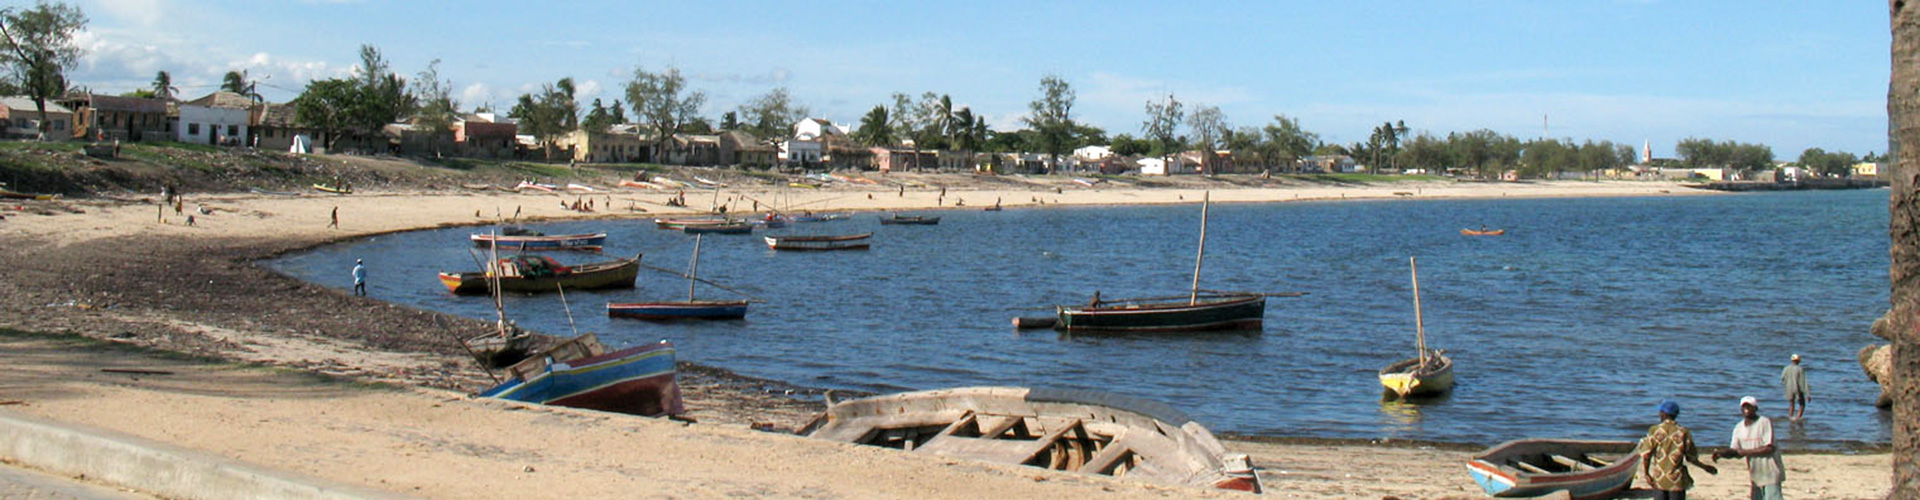 Ilha de Mozambique Aerial View